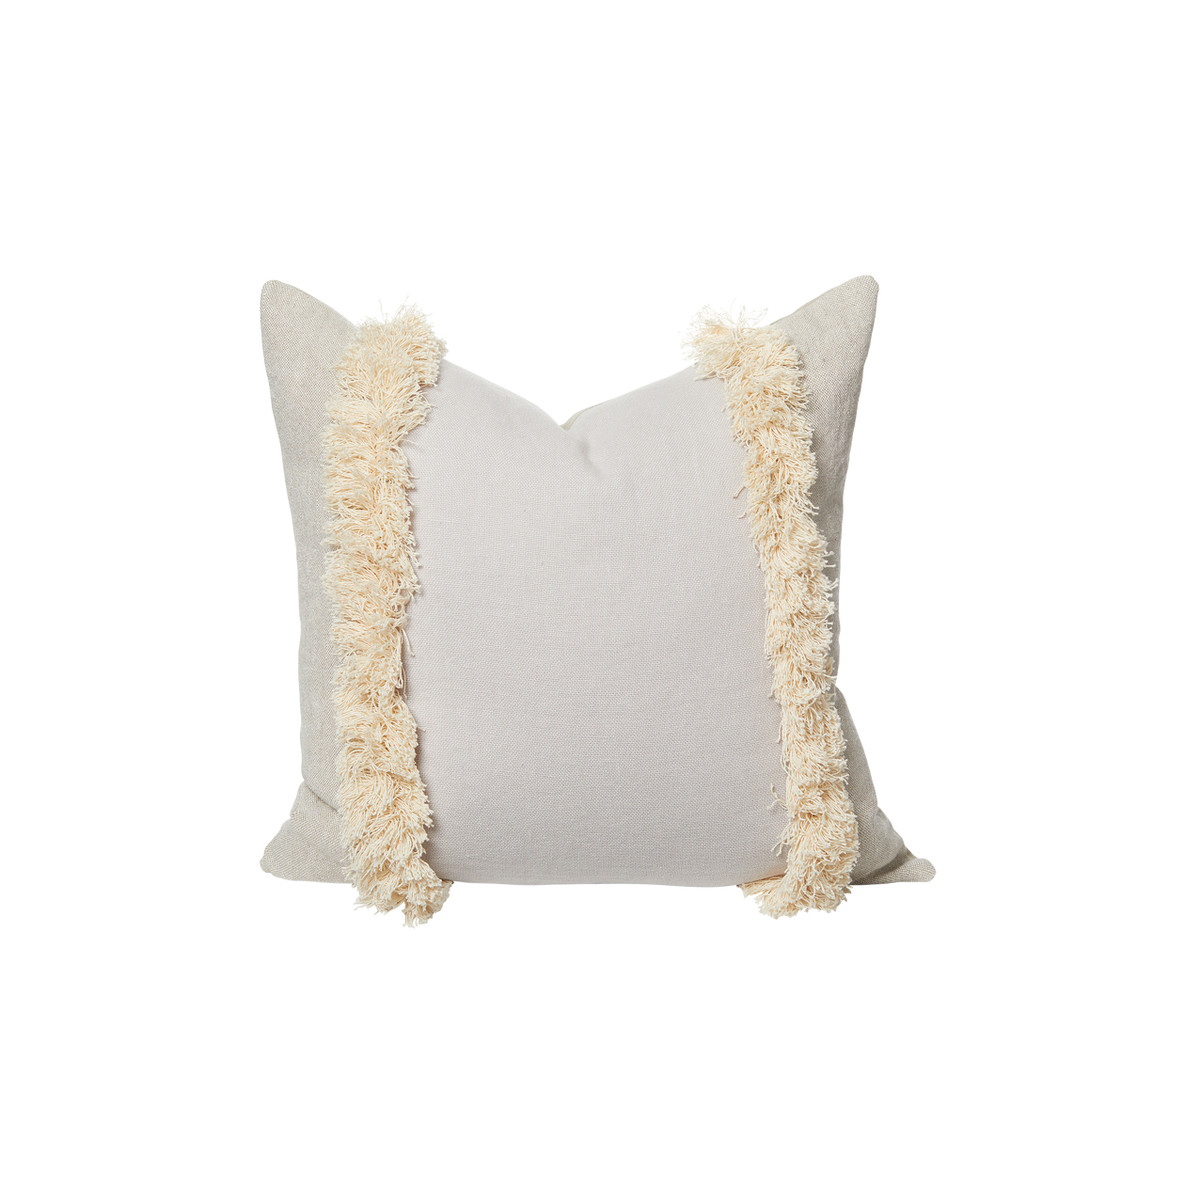 Muse Linen Pillow Mist Gray - Front